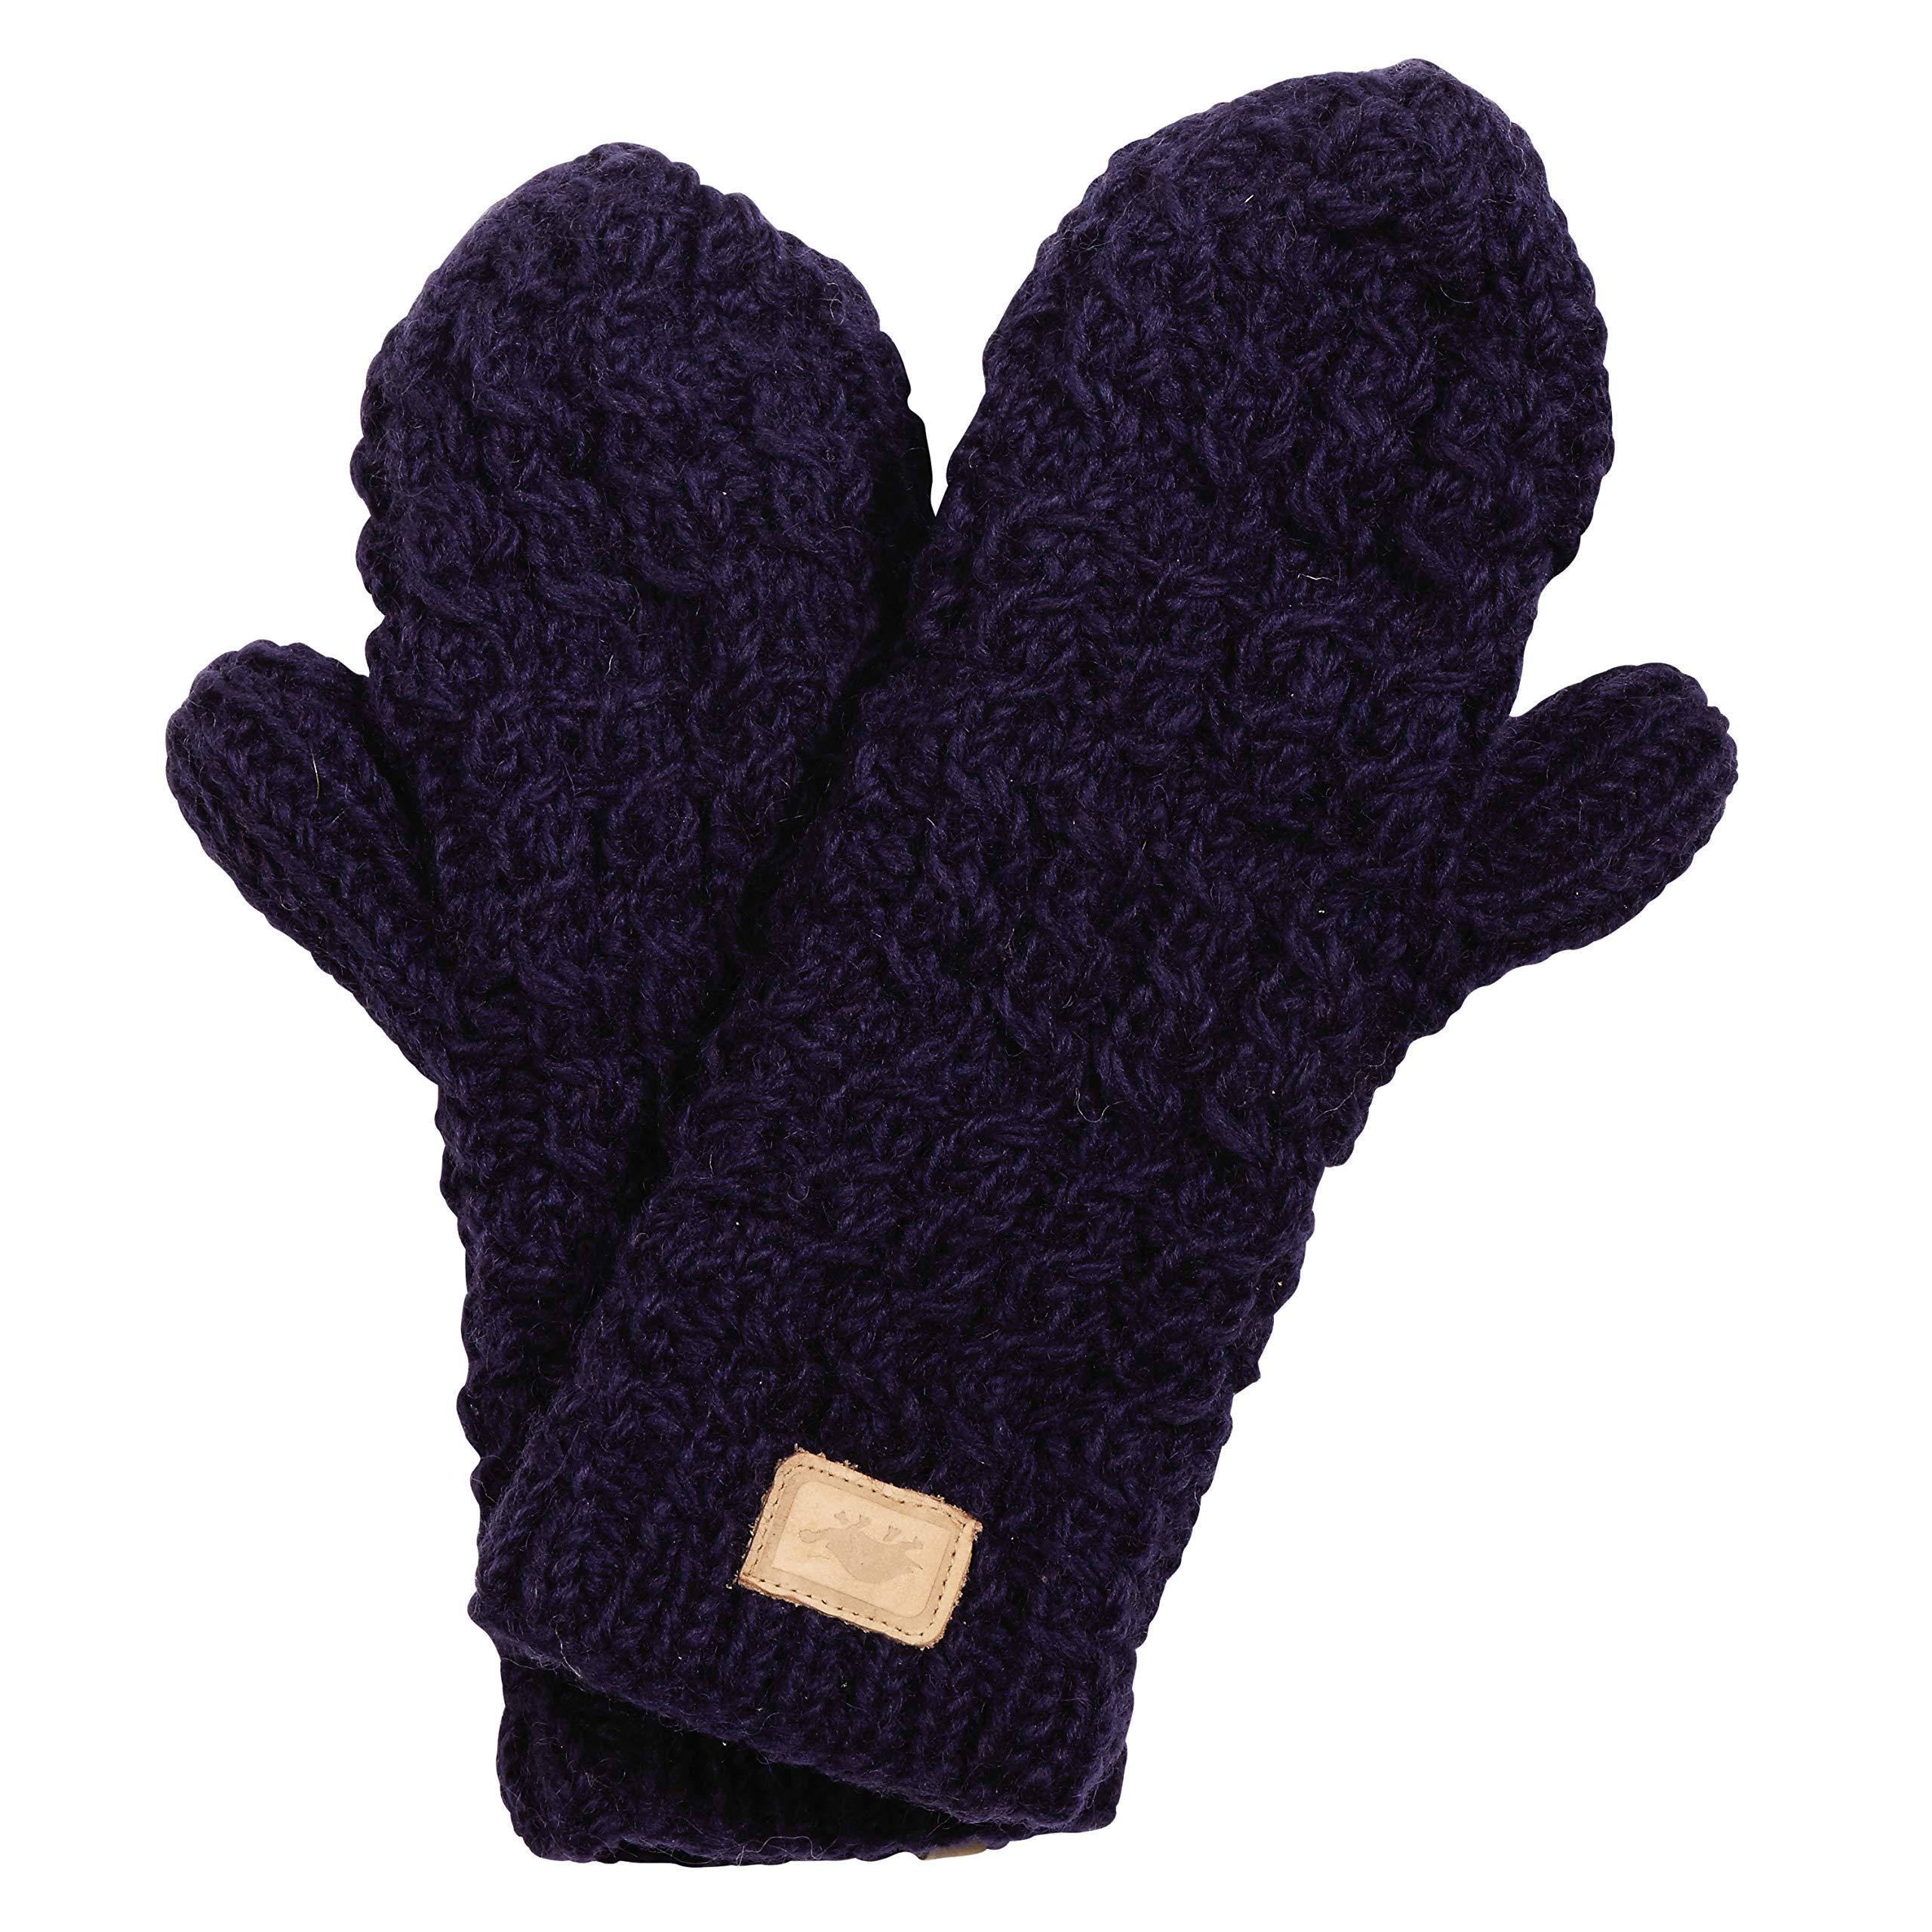 Turtle Fur Mika Mittens Nepal Hand Knit Wool Mitten Lined/Fleece Midnight